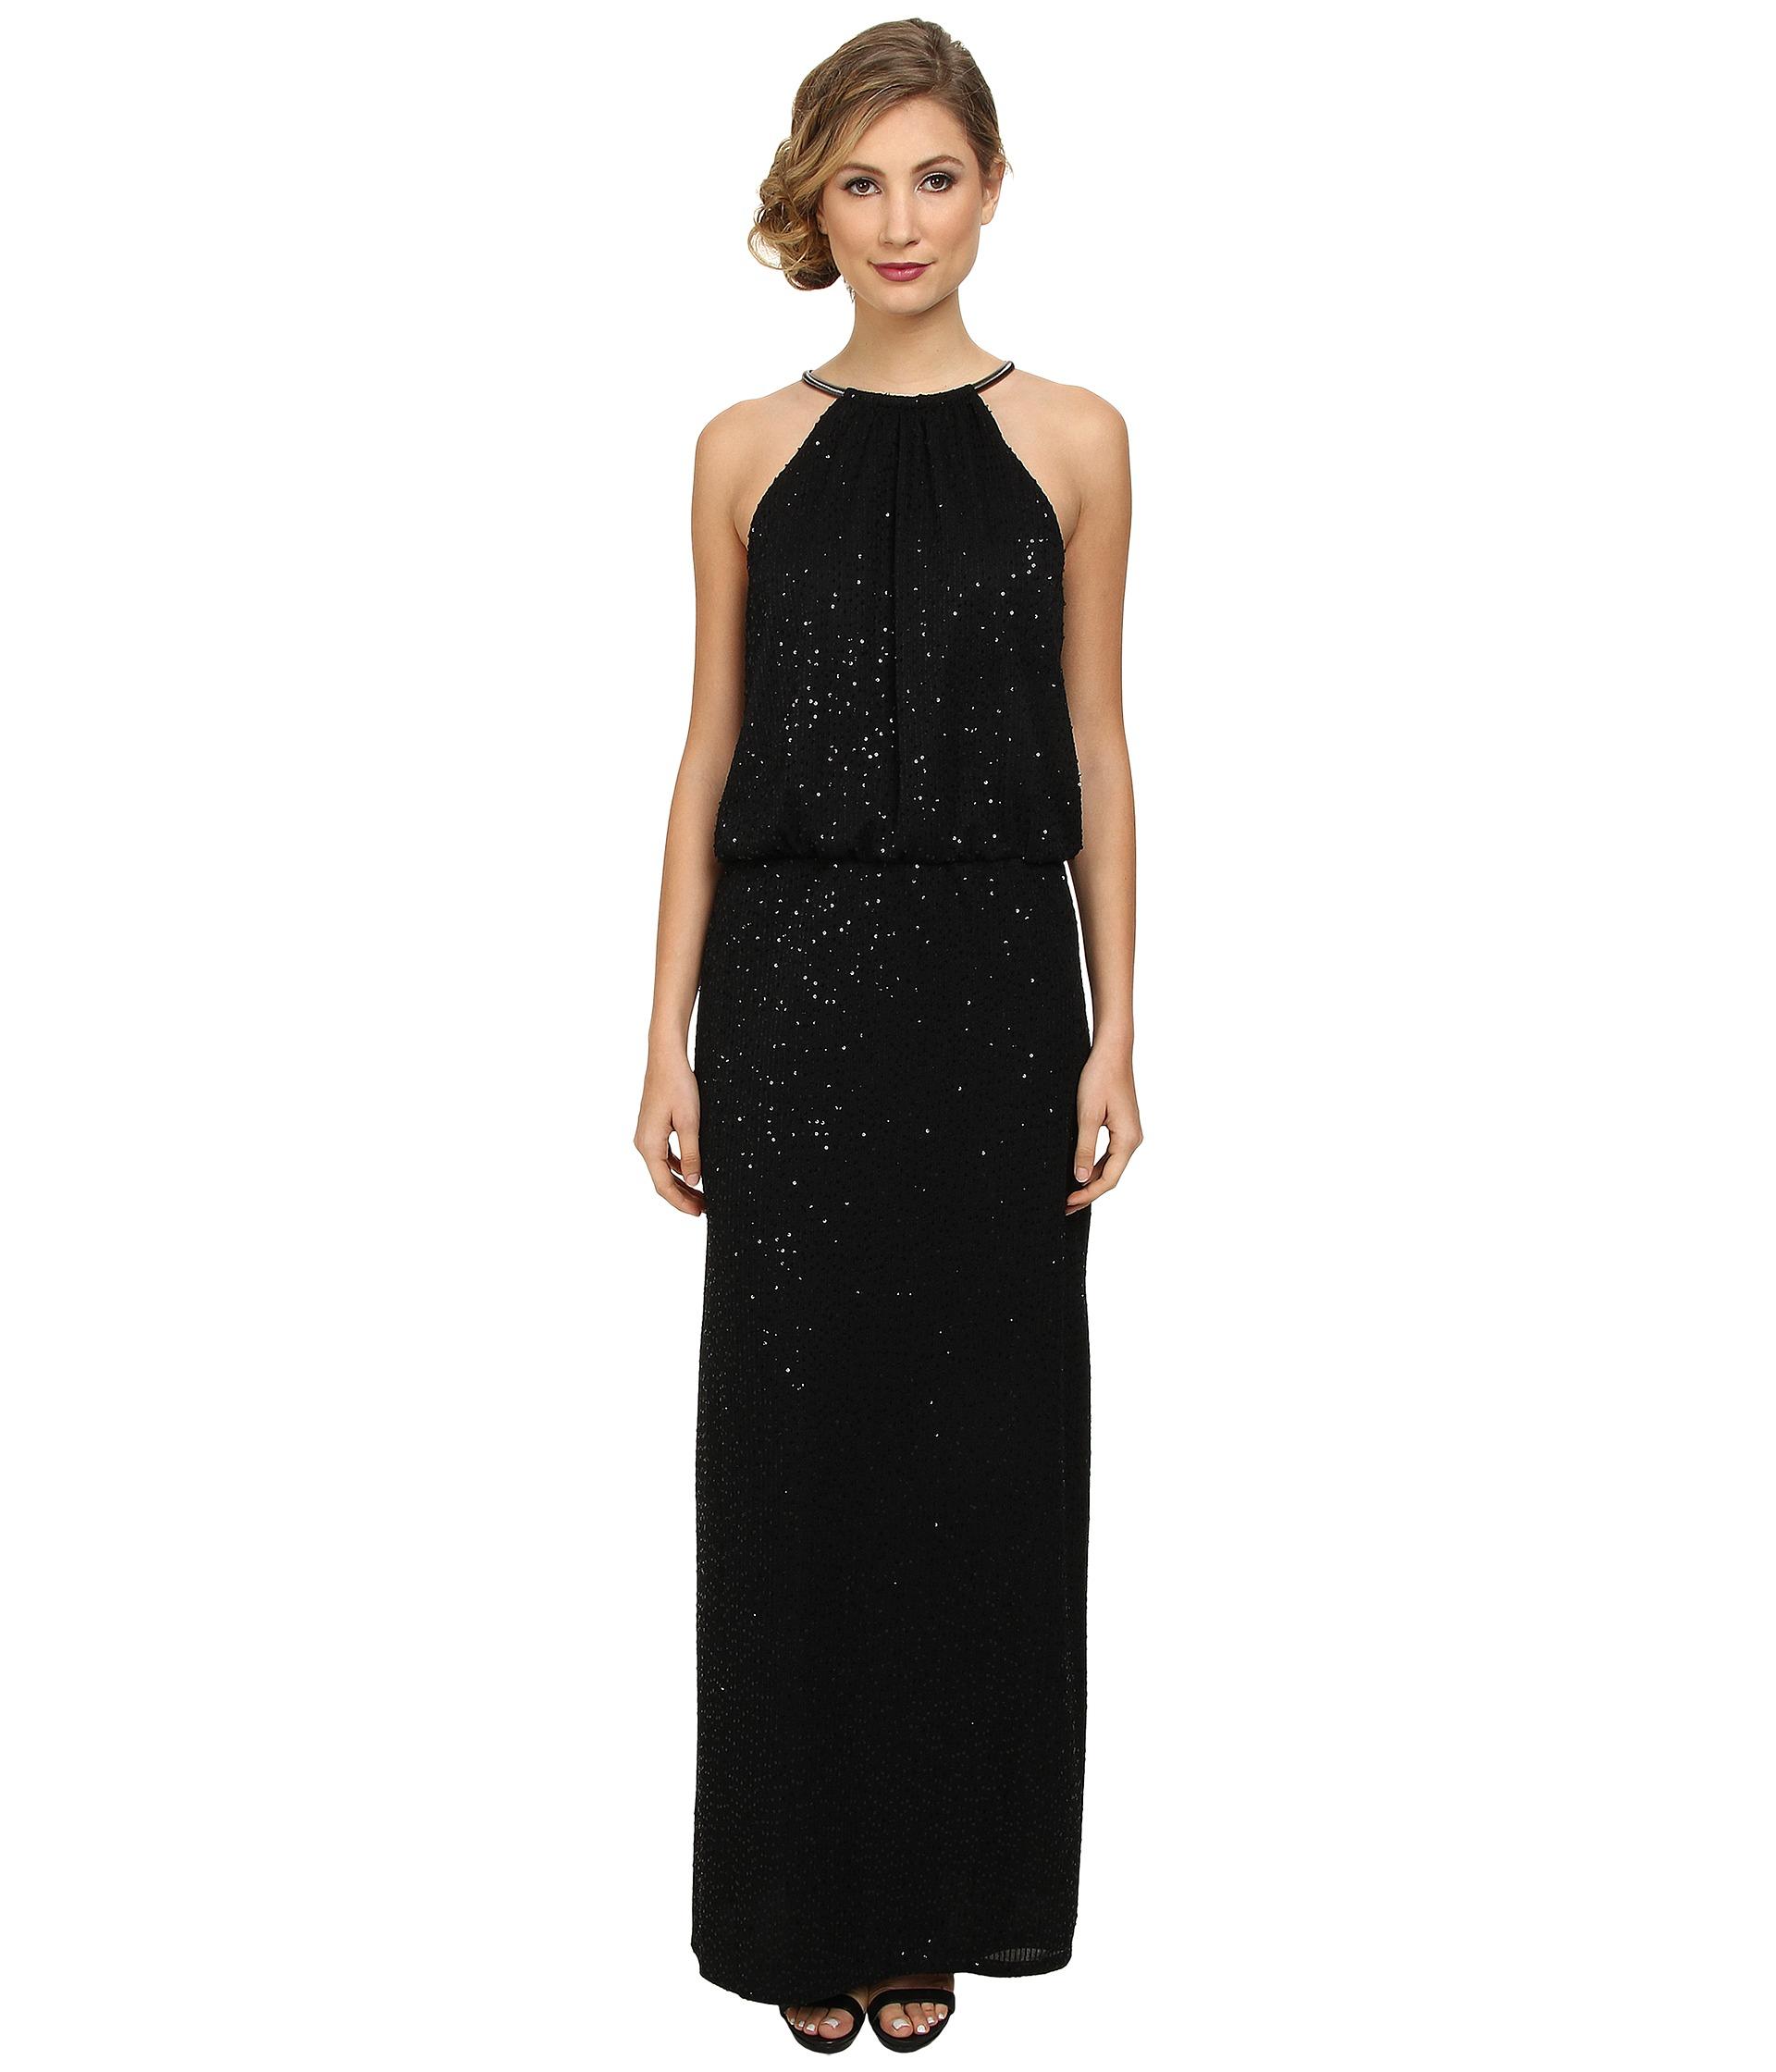 Jessica Simpson Formal Dresses – fashion dresses